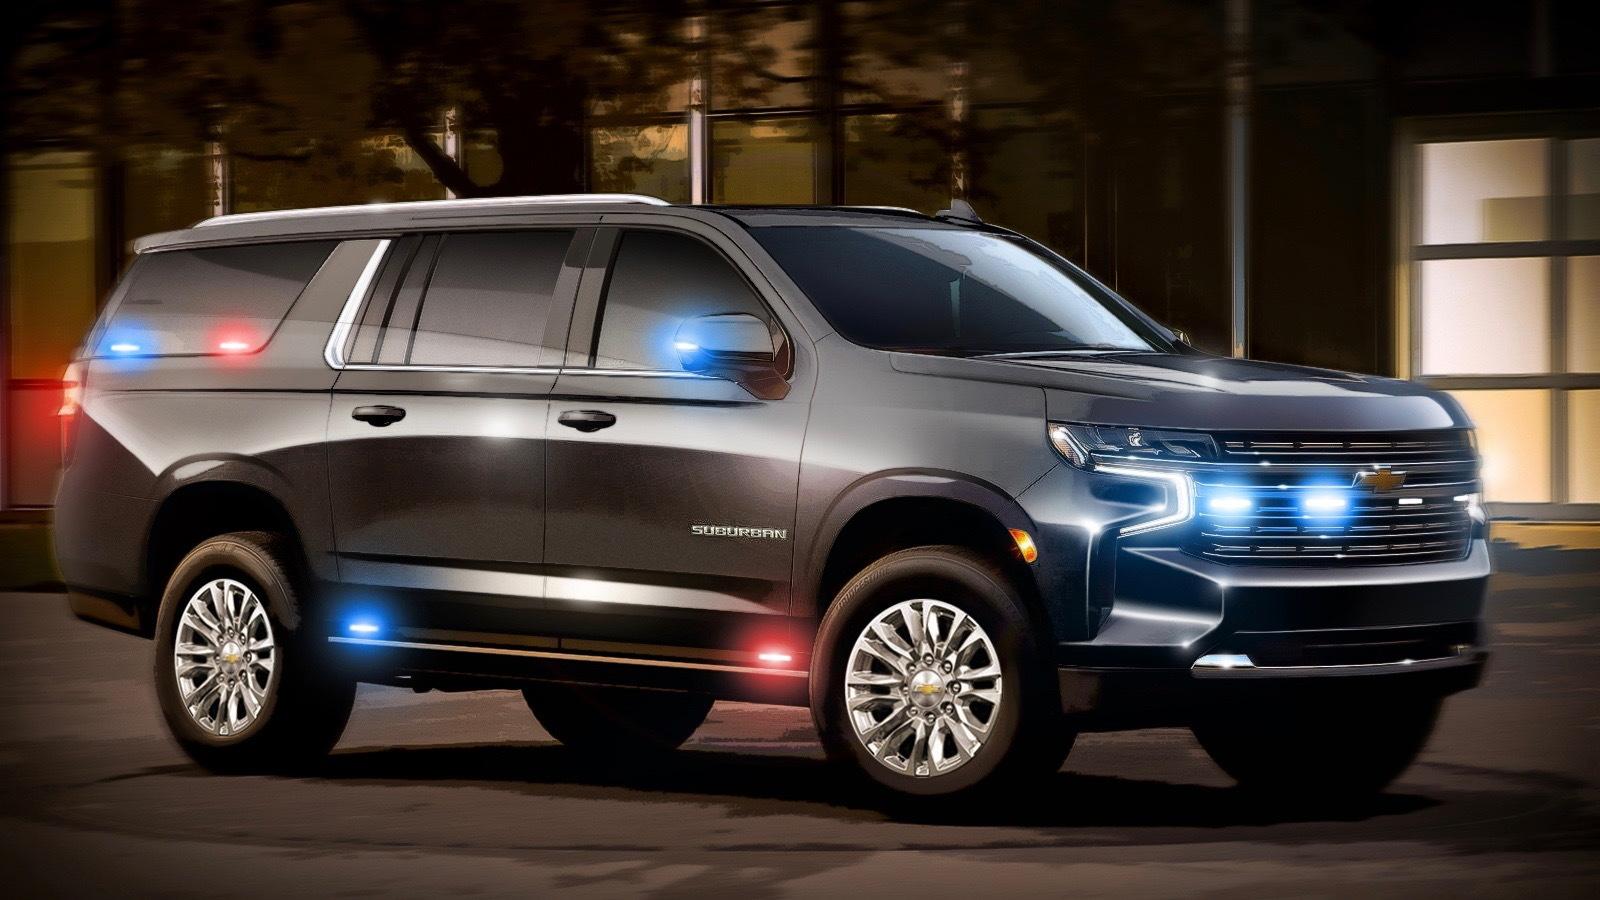 Rendering of U.S. State Department Chevrolet Suburban HD